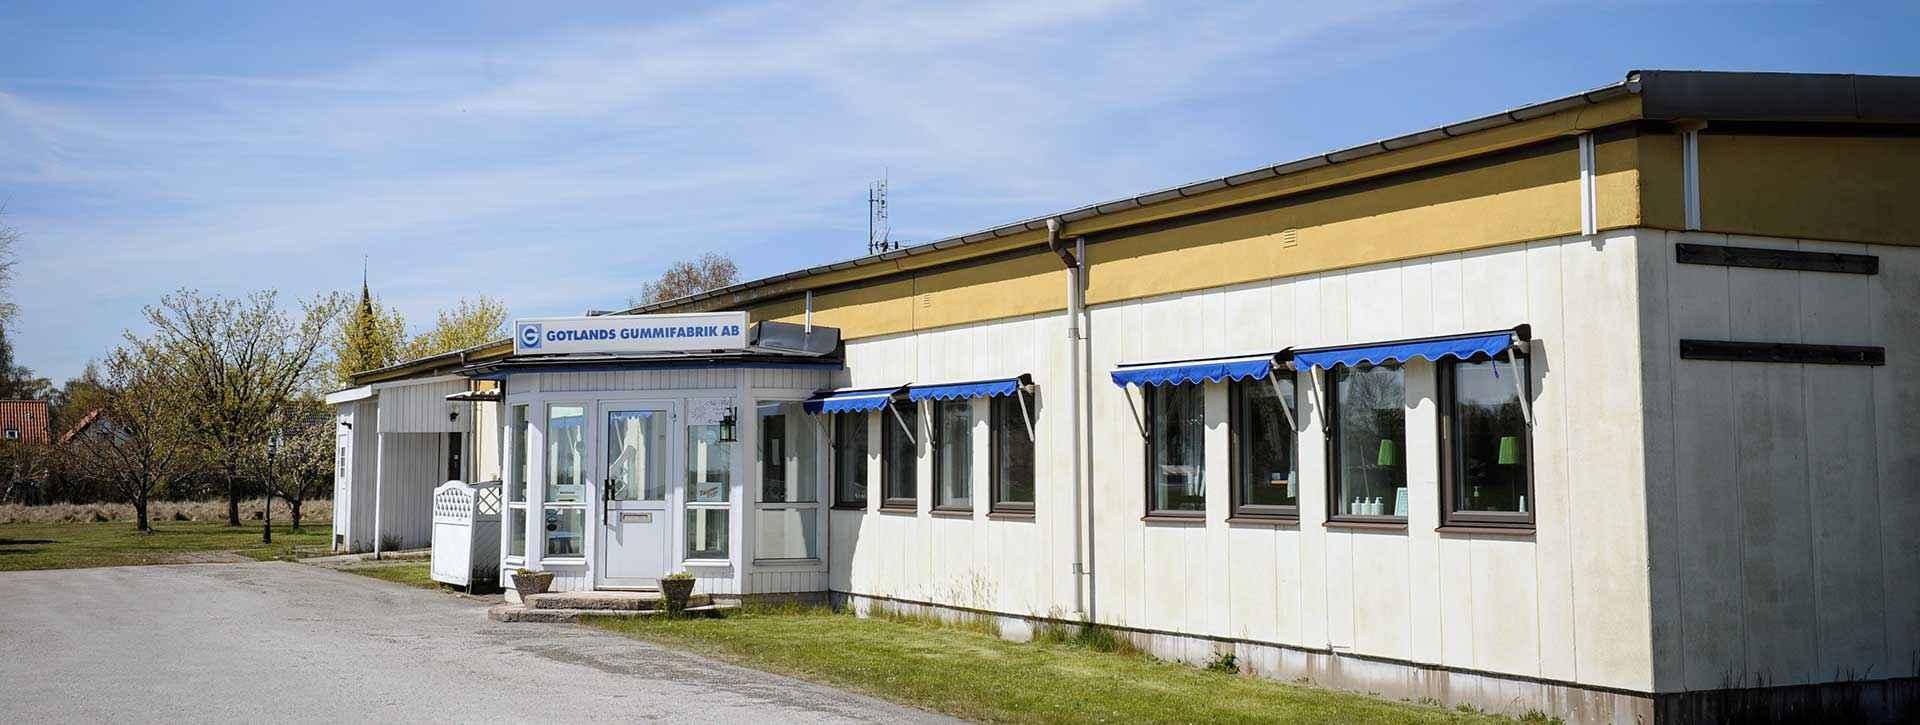 Kontakta Gotlands Gummifabrik AB